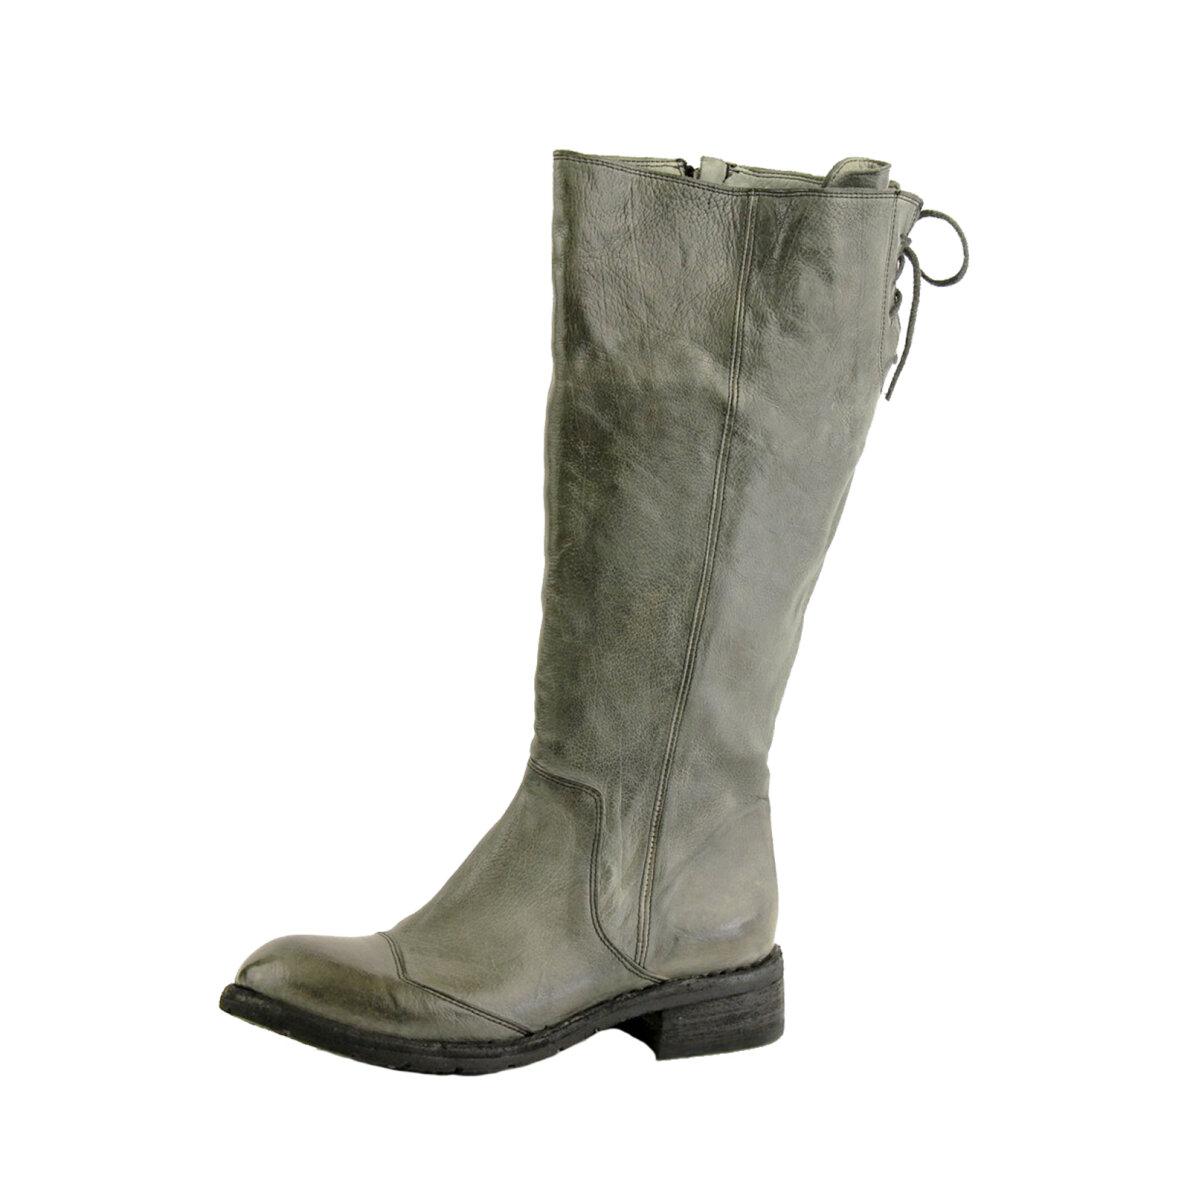 PIEDI Bubetti 9694 sort lang dame støvle i vasket skind